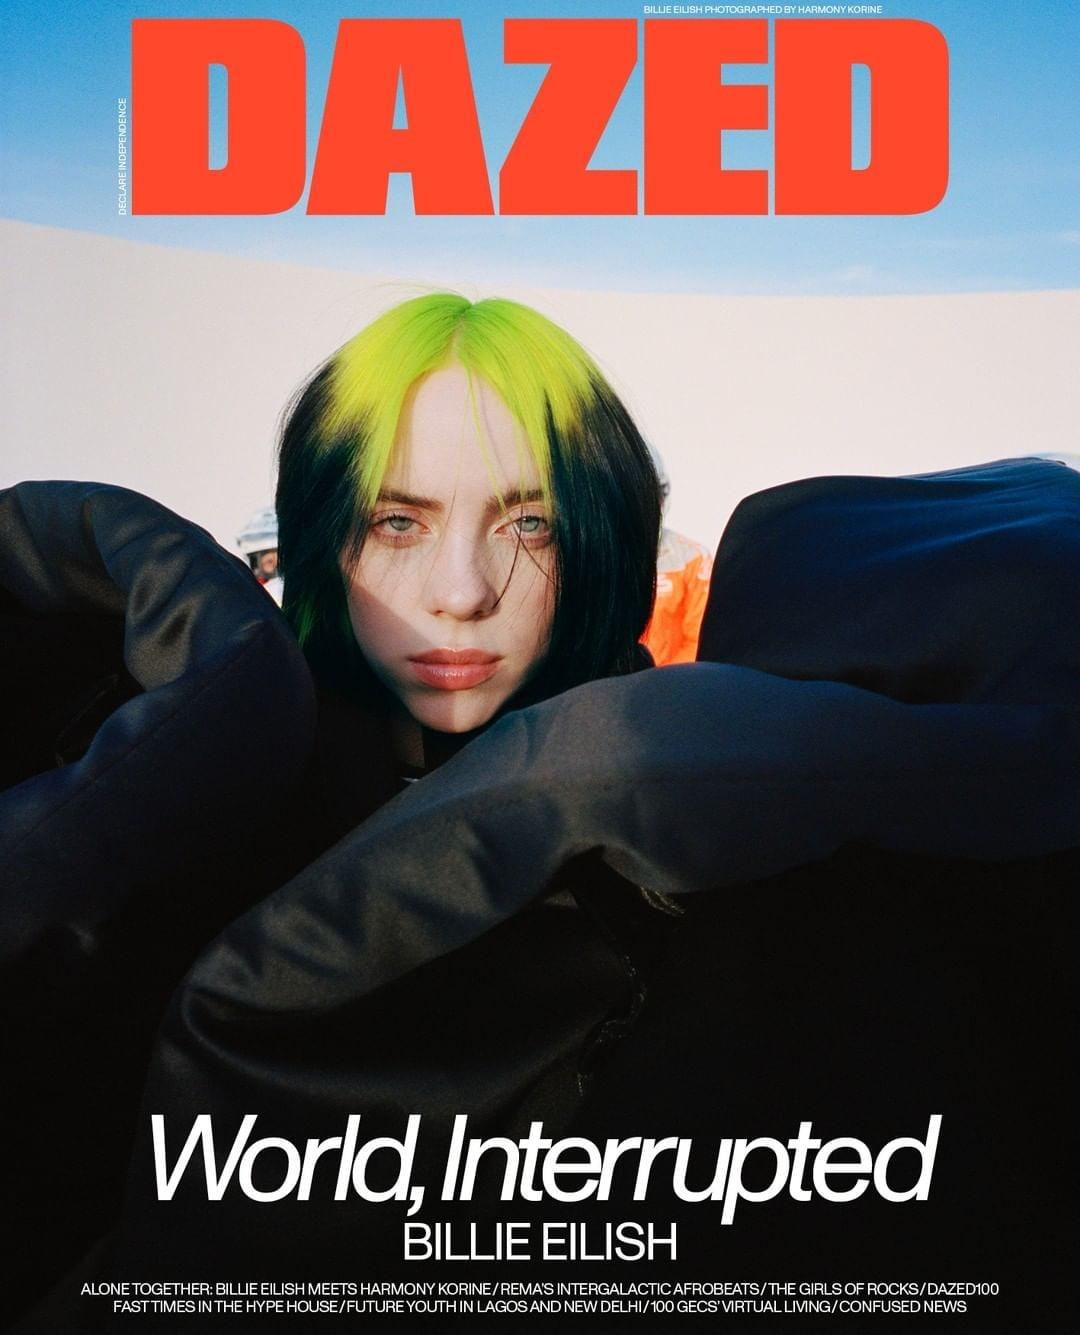 Billie Eilish Dazed 2020 10 - Фото: Билли Айлиш на обложке журнала Dazed